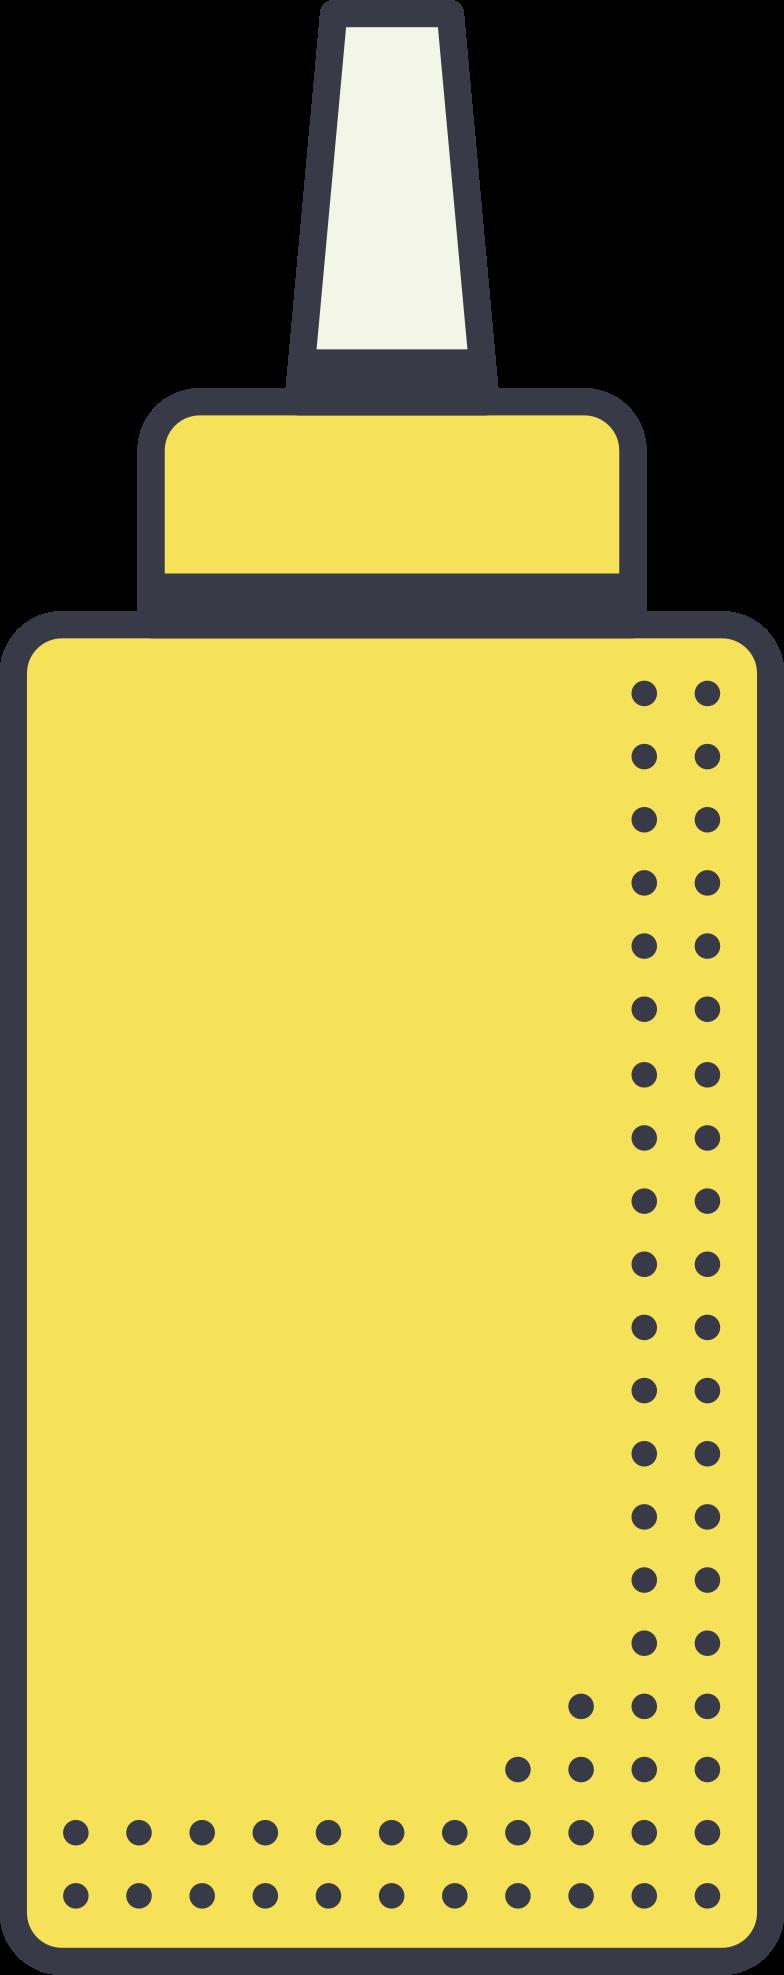 mustard Clipart illustration in PNG, SVG